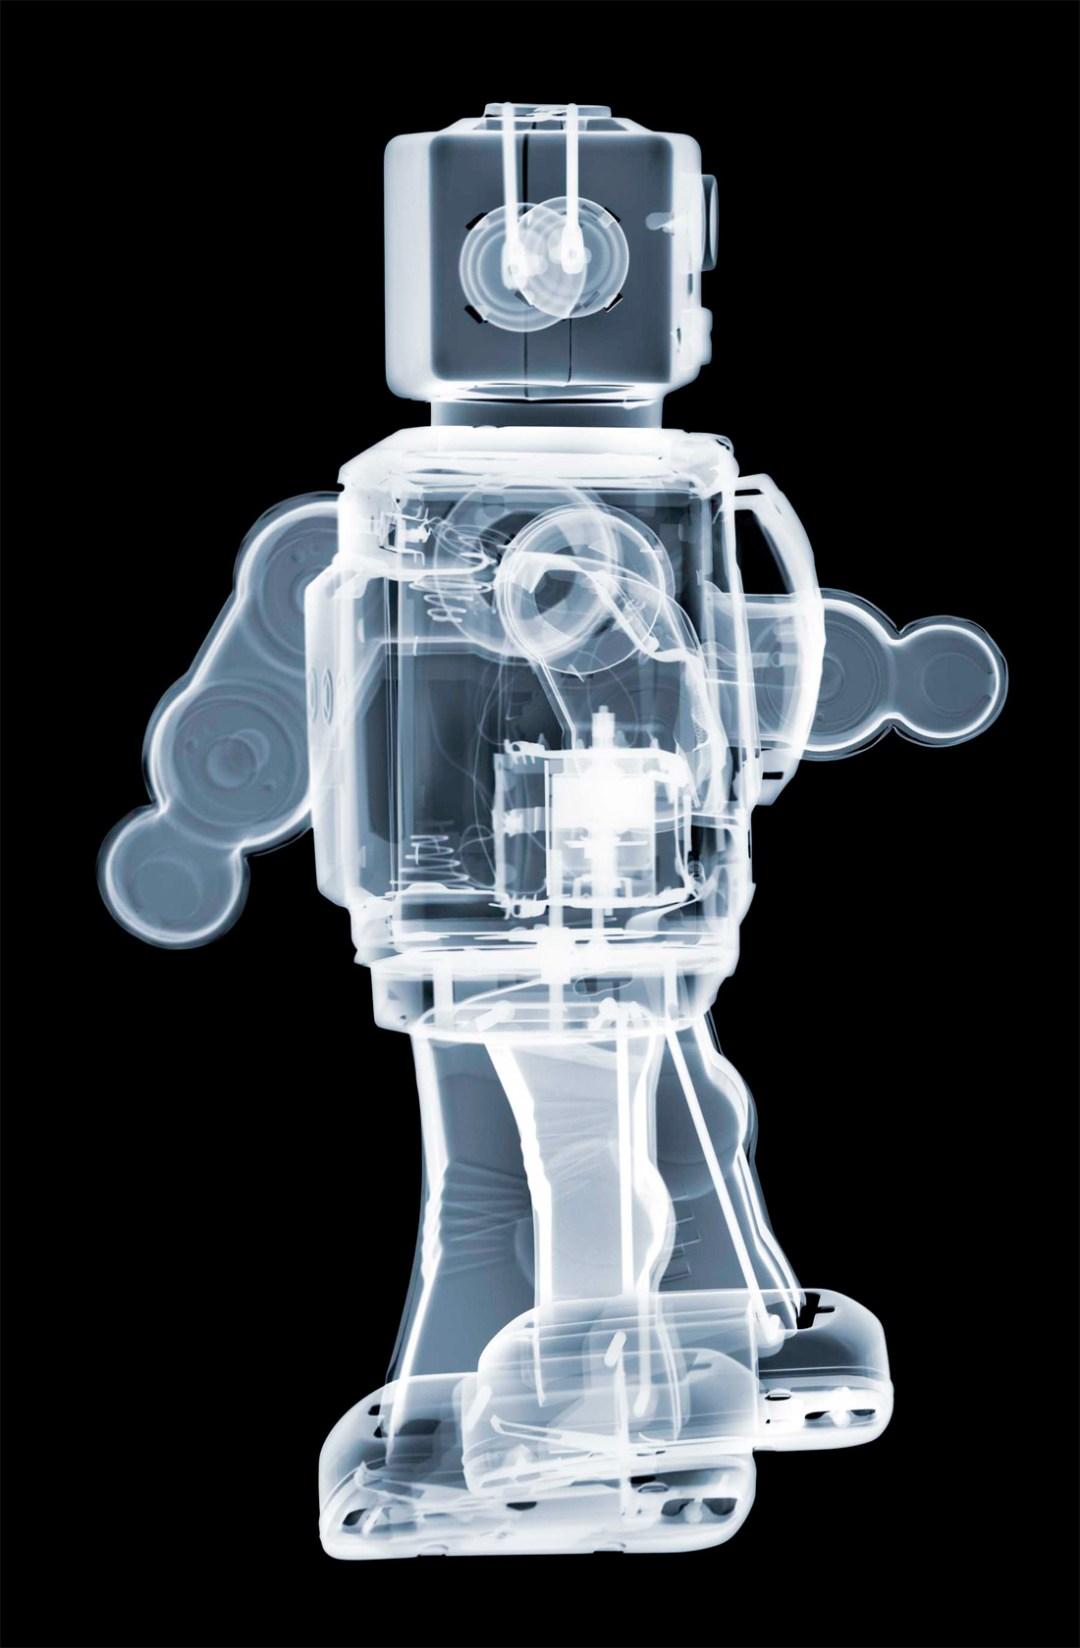 Nick Veasey :: X-Ray Photos (2)